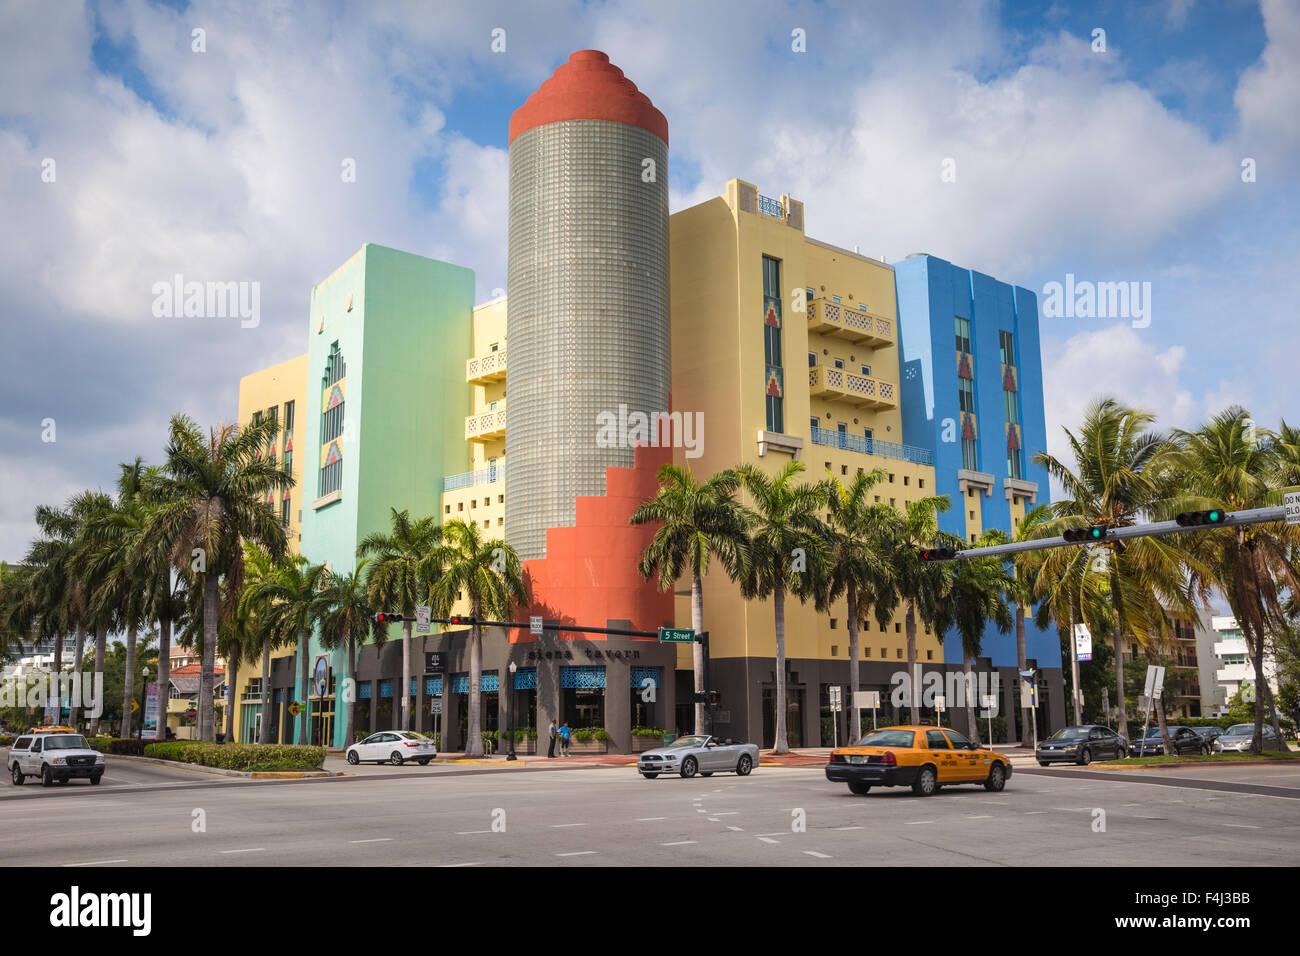 Buildings on Washington Avenue, South Beach, Miami Beach, Miami, Florida, United States of America, North America - Stock Image